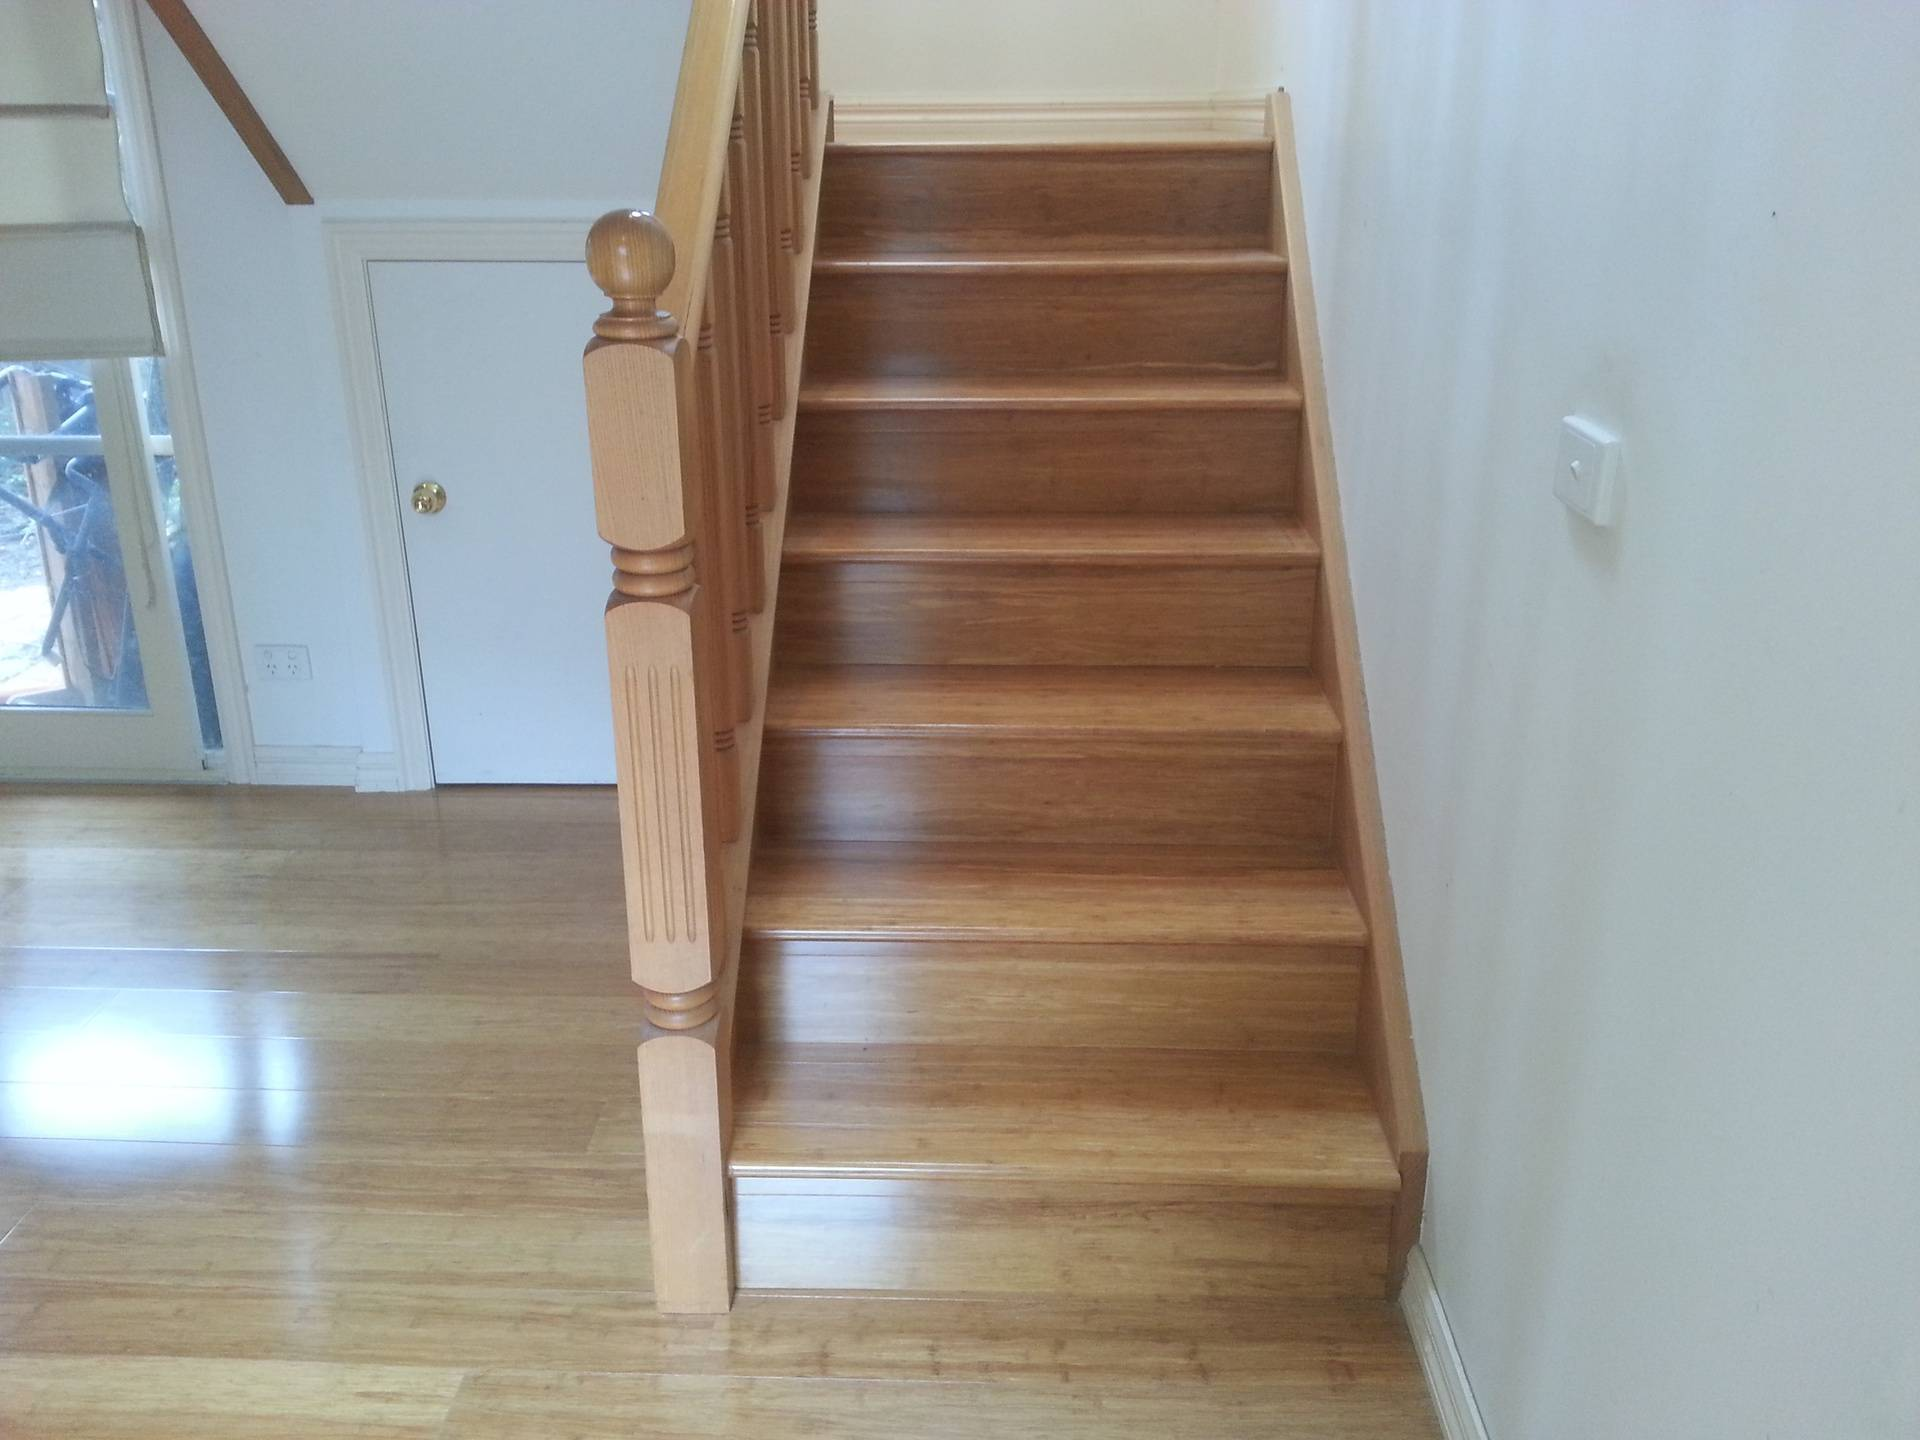 Sandy Bamboo staircase